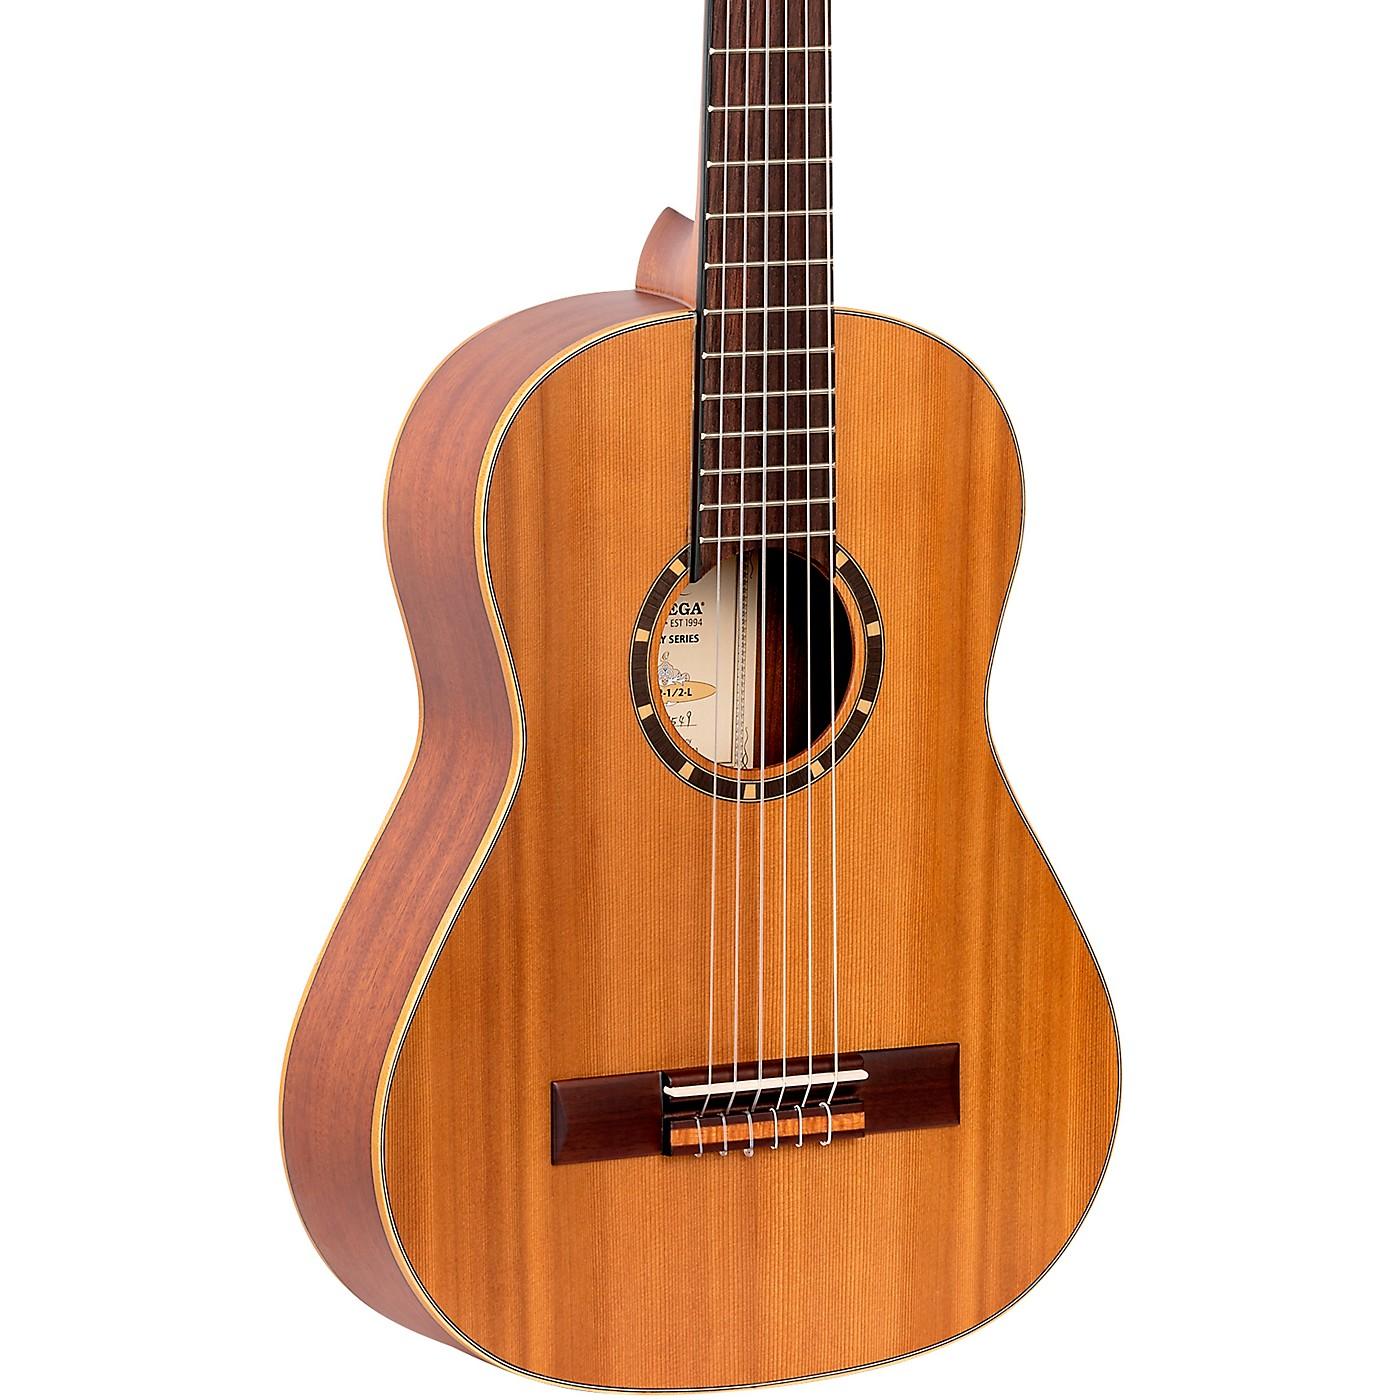 Ortega Family Series R122-1/2-L Classical Guitar thumbnail